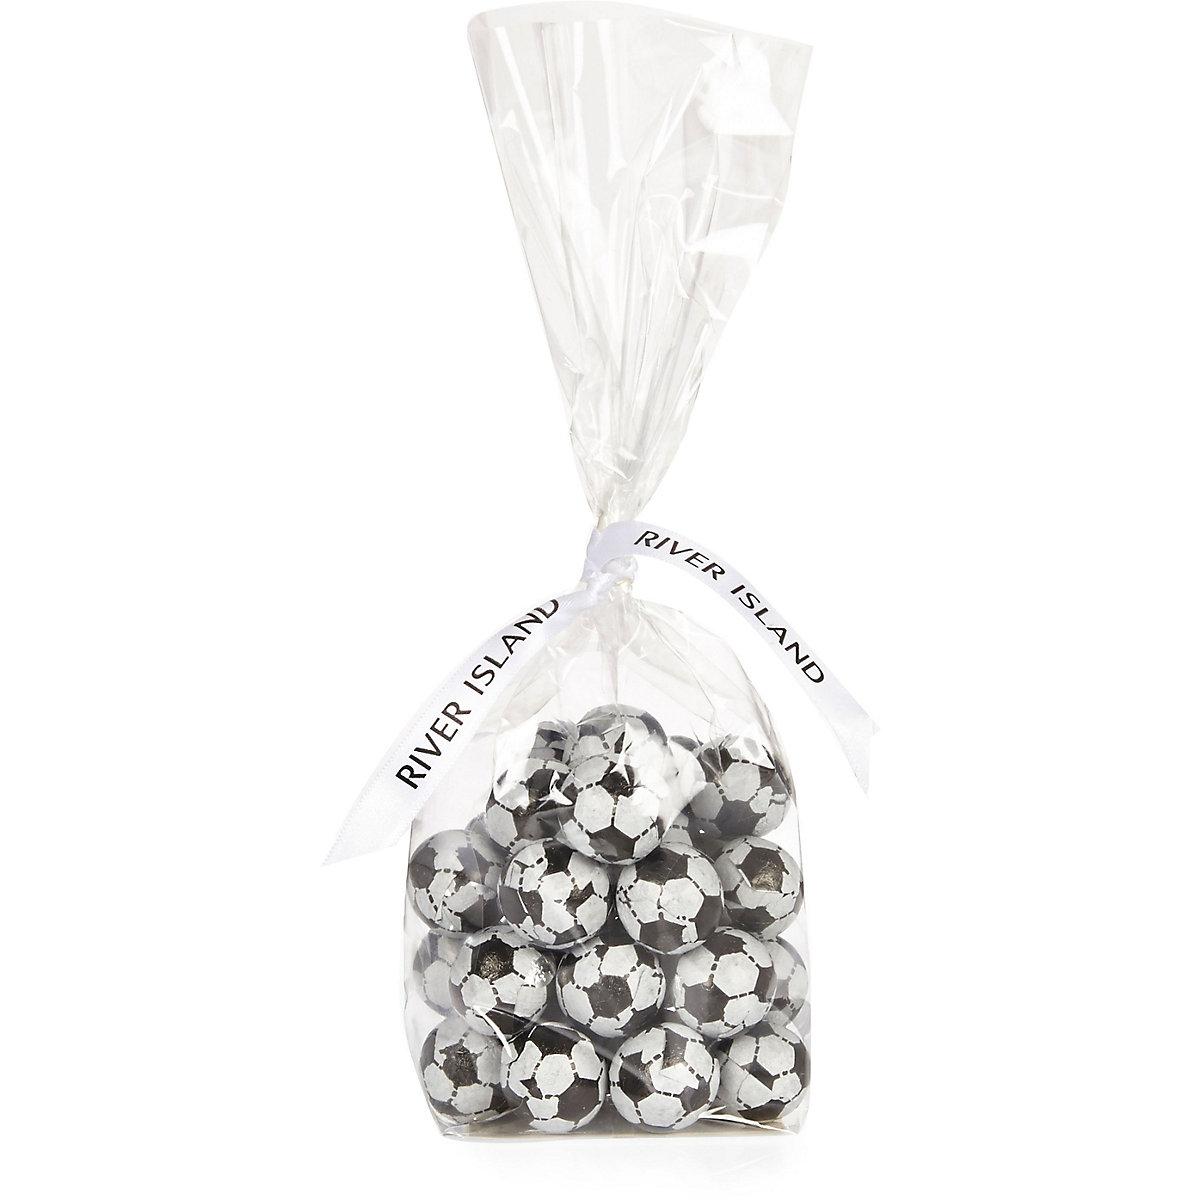 Chocolate footballs gift pack